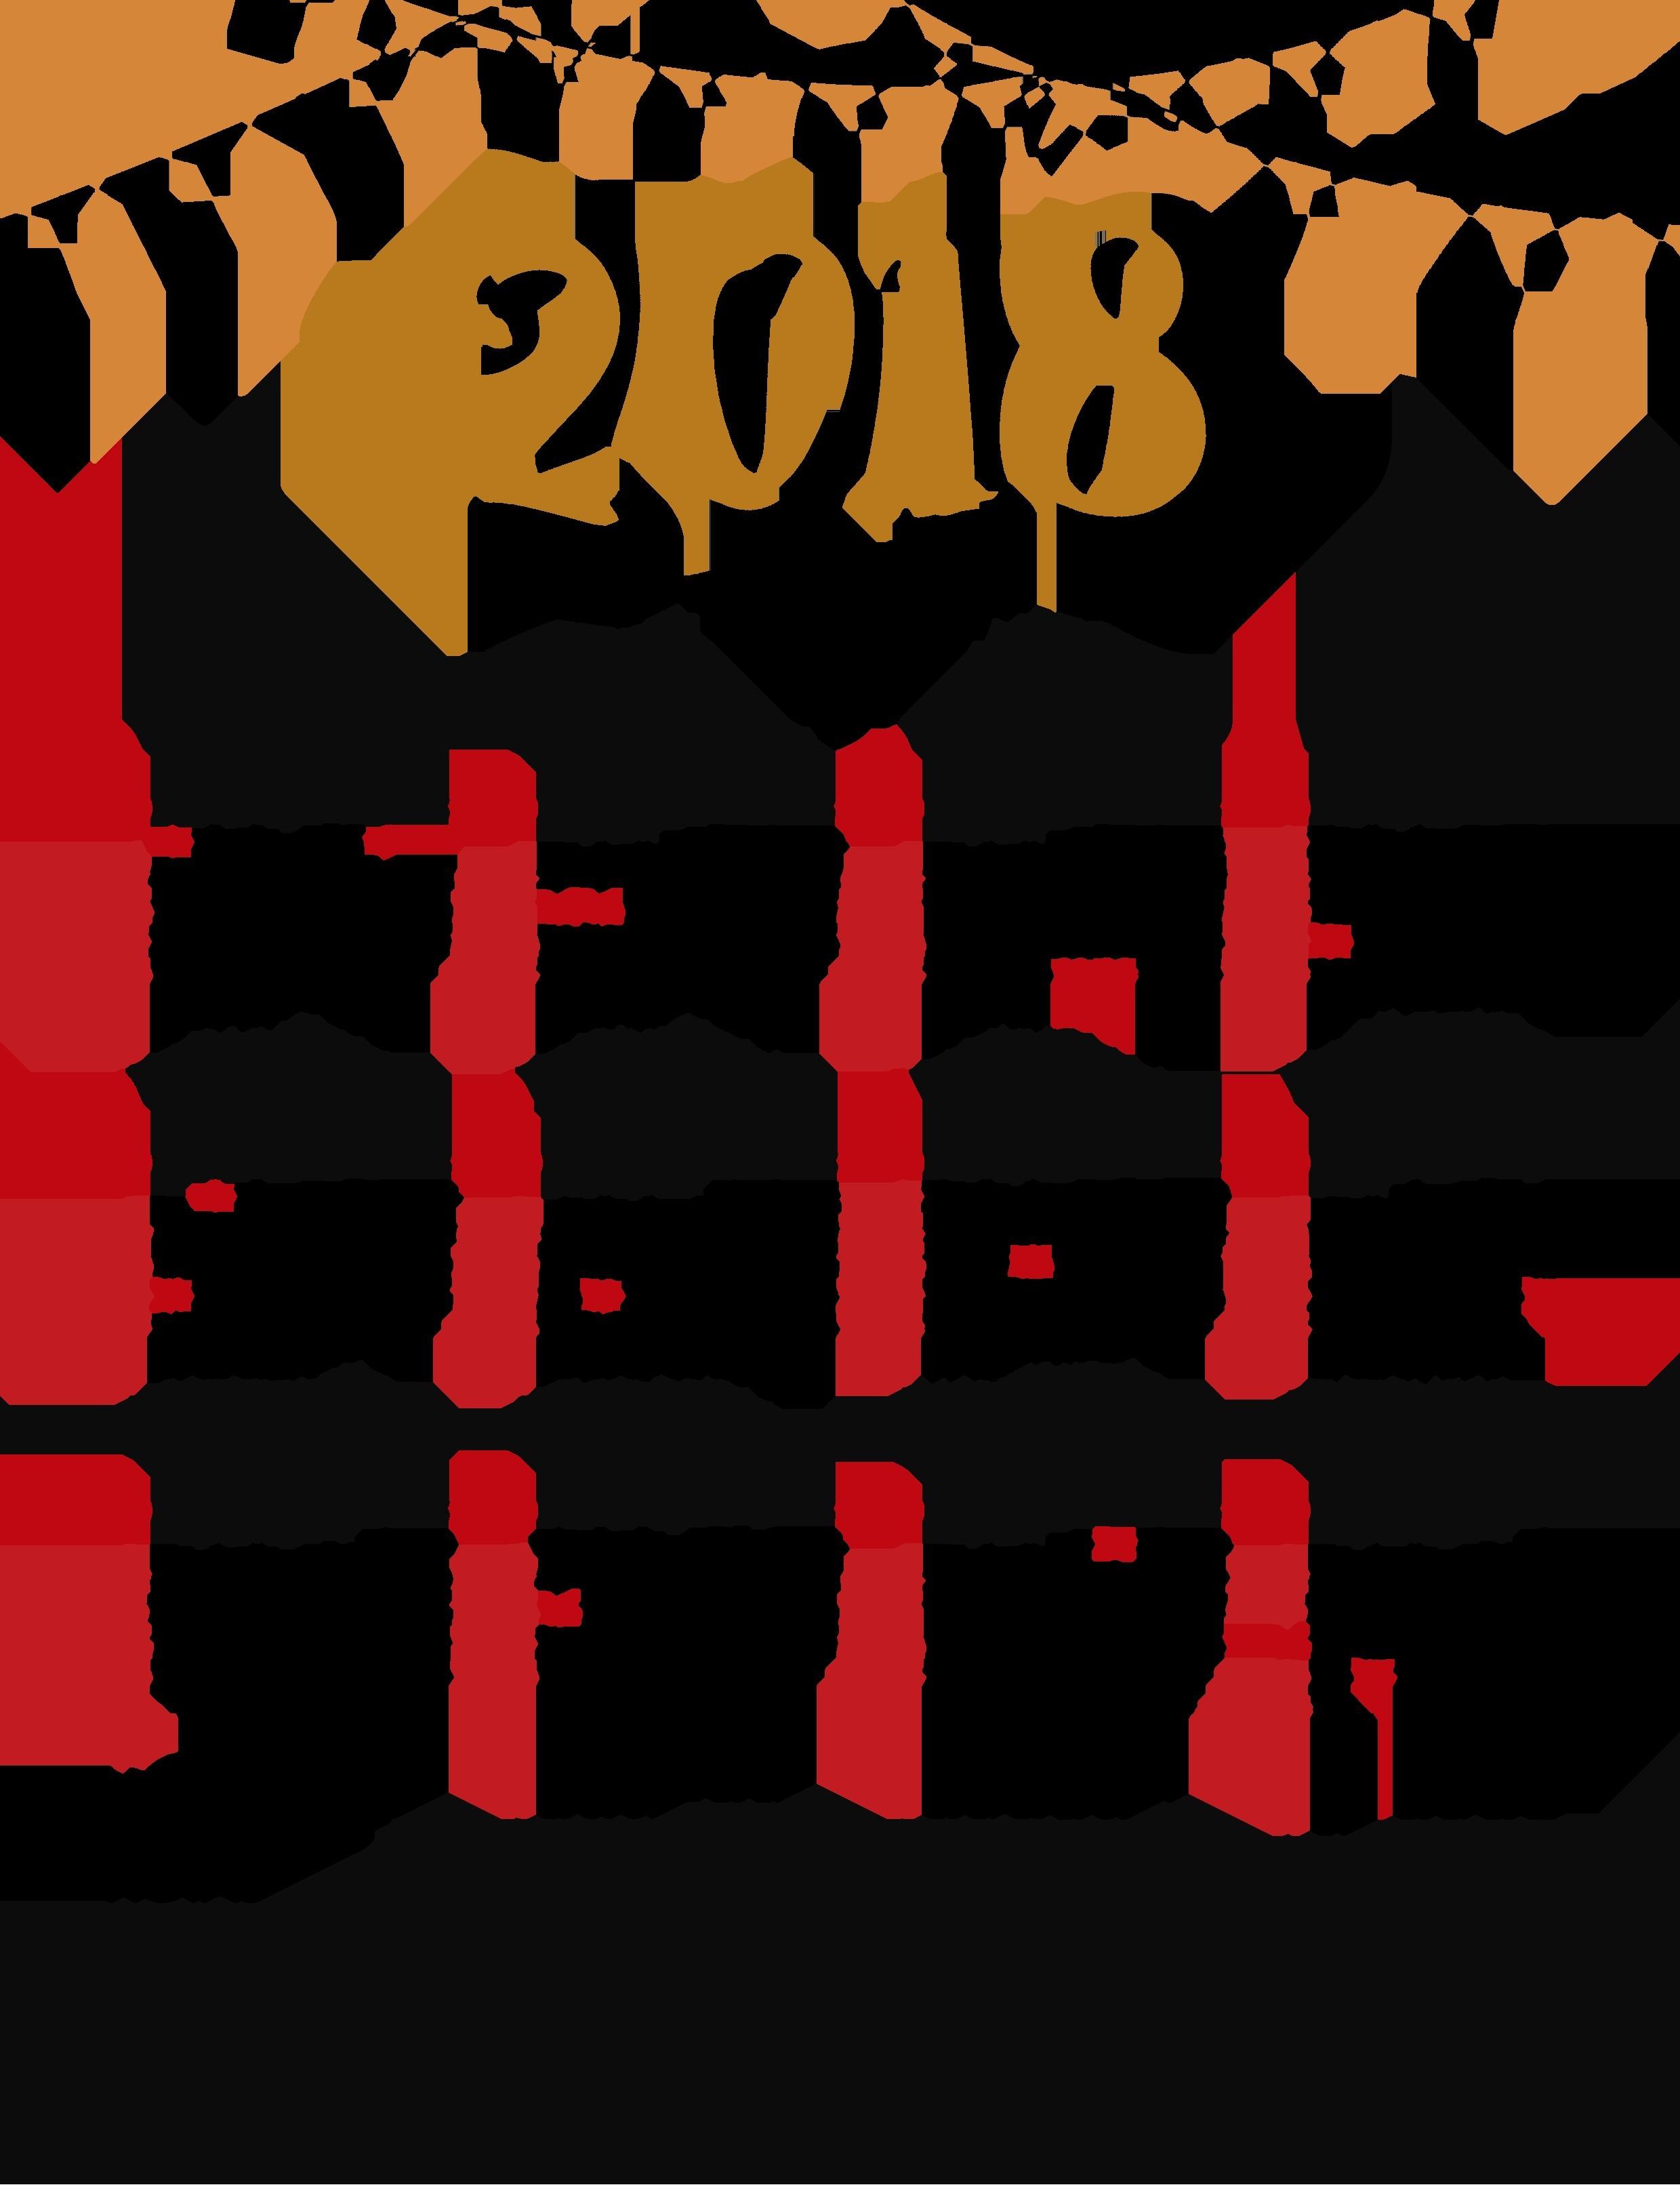 Calendario Escolar 2019 Argentina Vacaciones De Invierno Actual Verificar Calendario 2019 Mexico Con Dias Festivos Para Imprimir